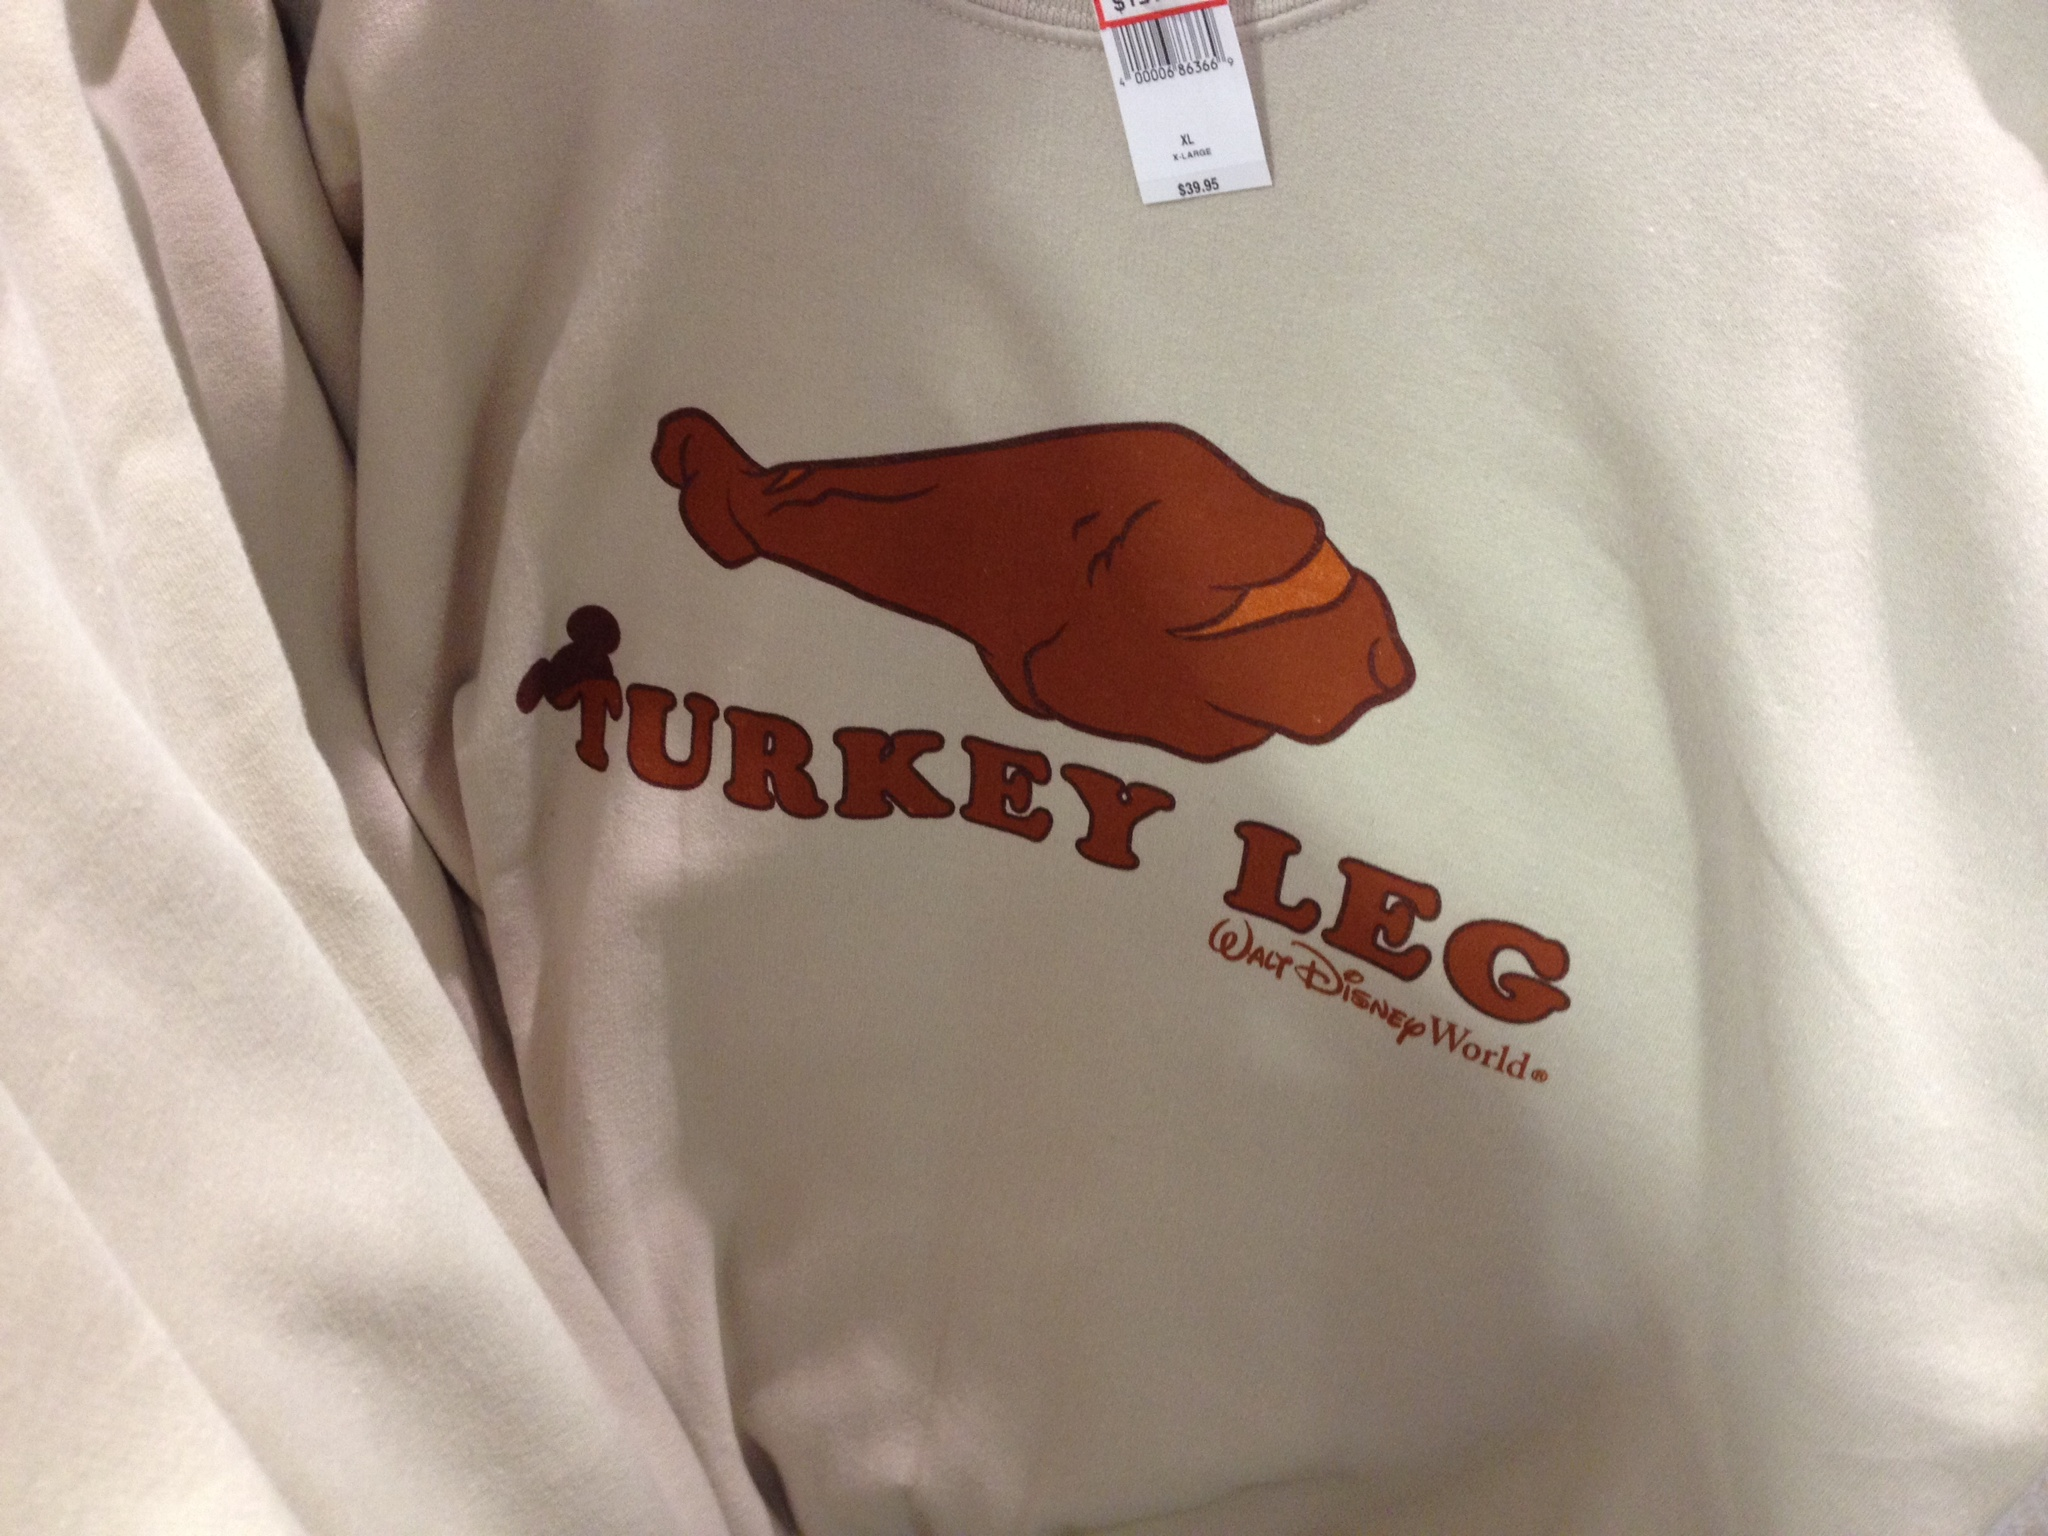 Turkey Leg Sweatshirt